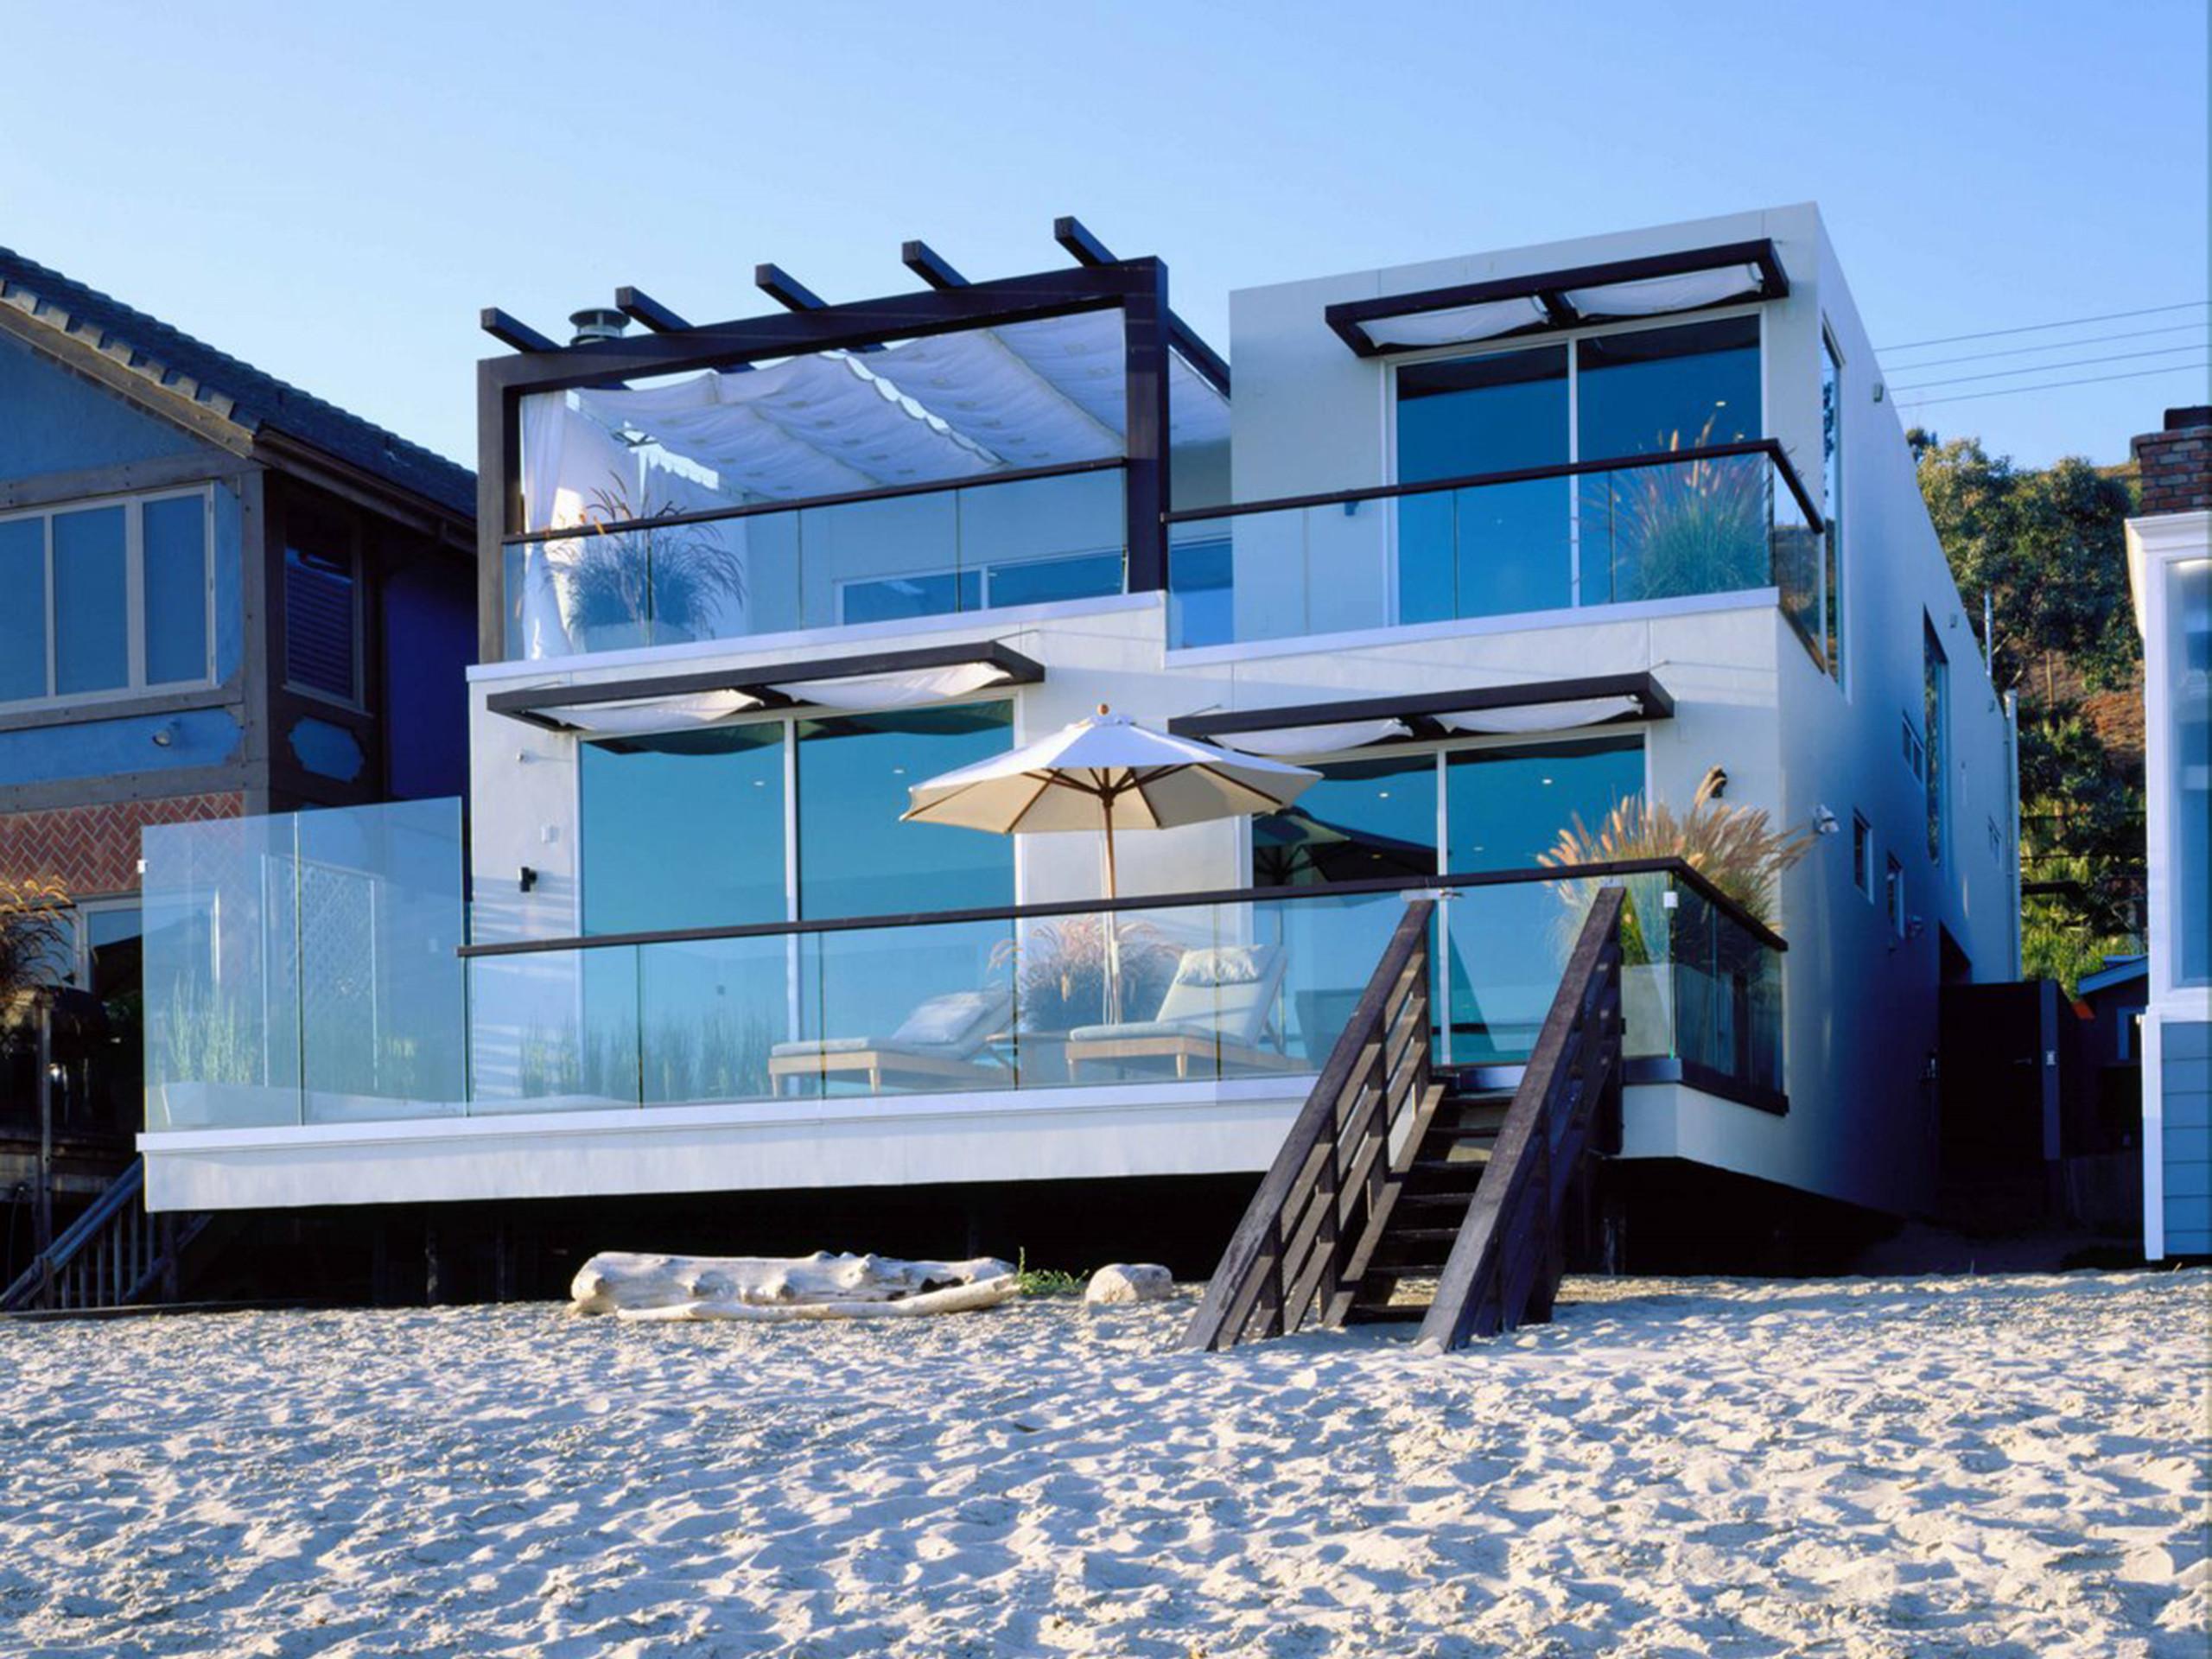 2560x1920, Modern Beach House Wallpaper   Data Id 331111 - Exterior Beach House Ideas - HD Wallpaper